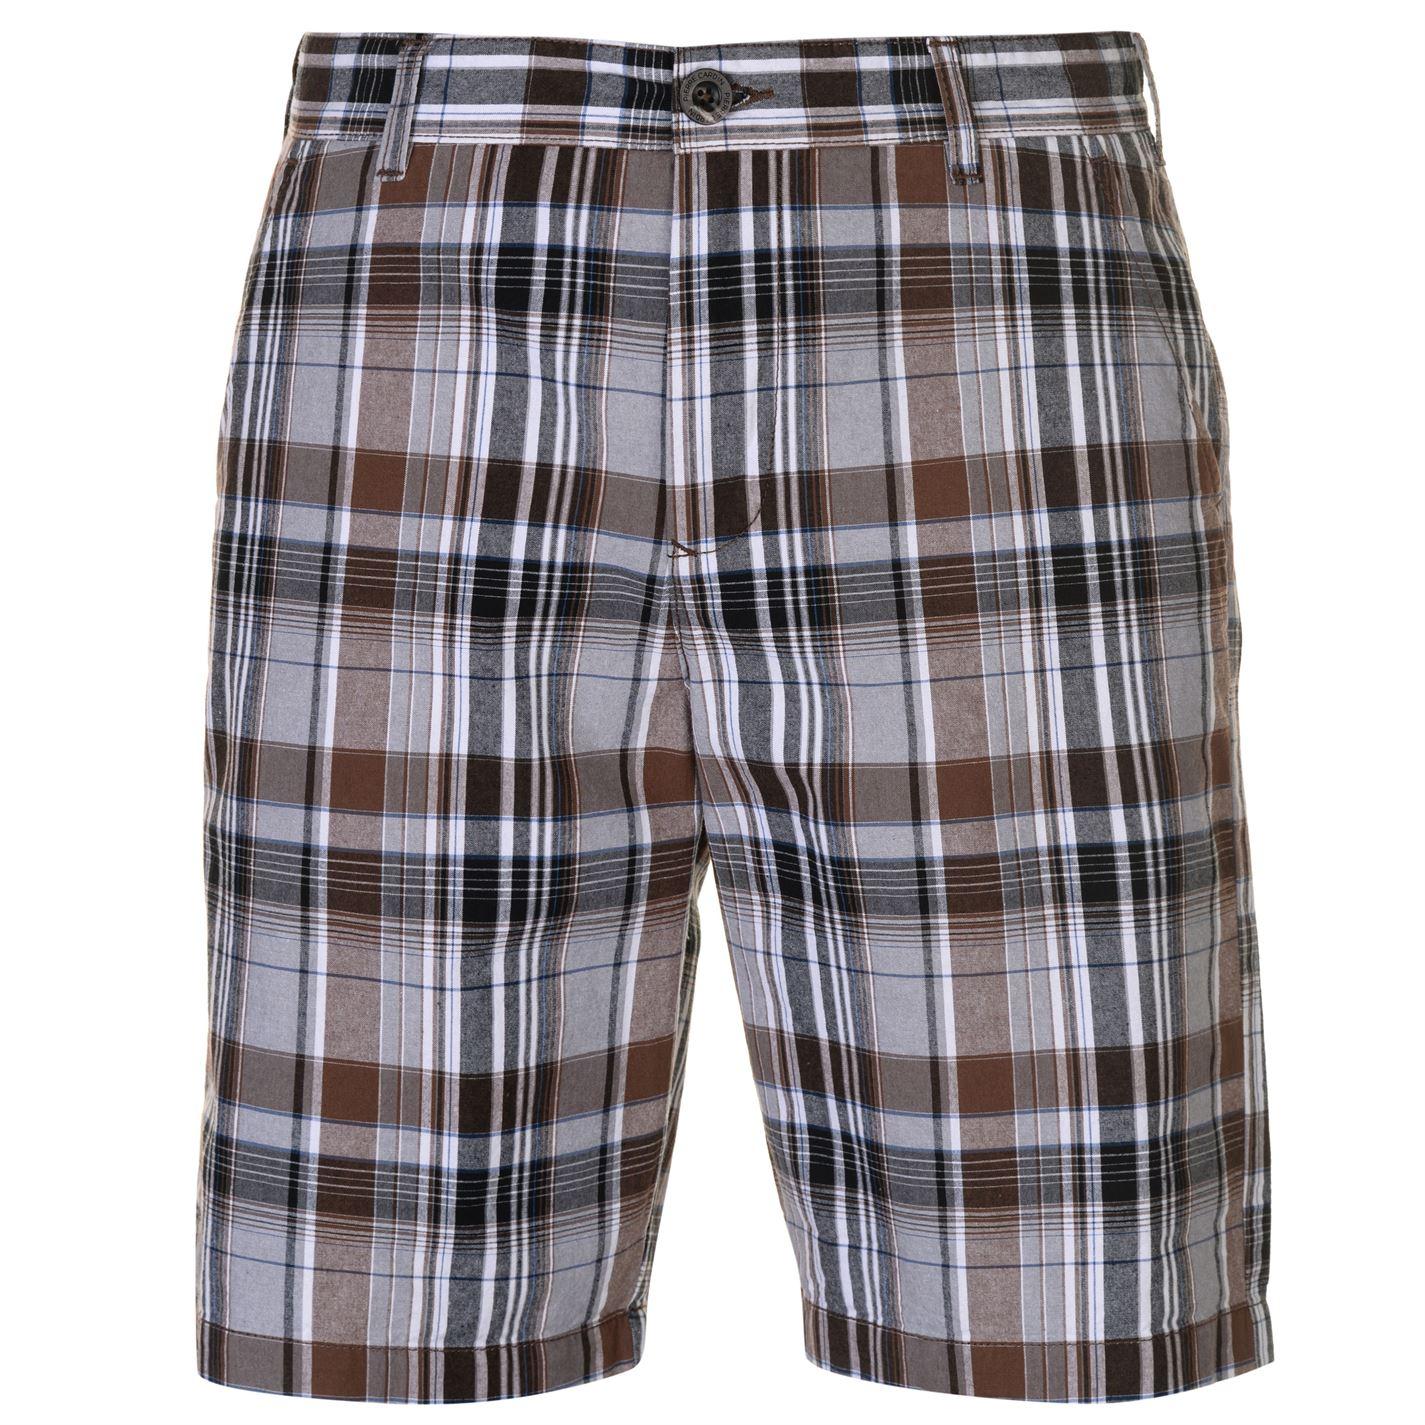 Pierre Cardin Check Shorts Mens